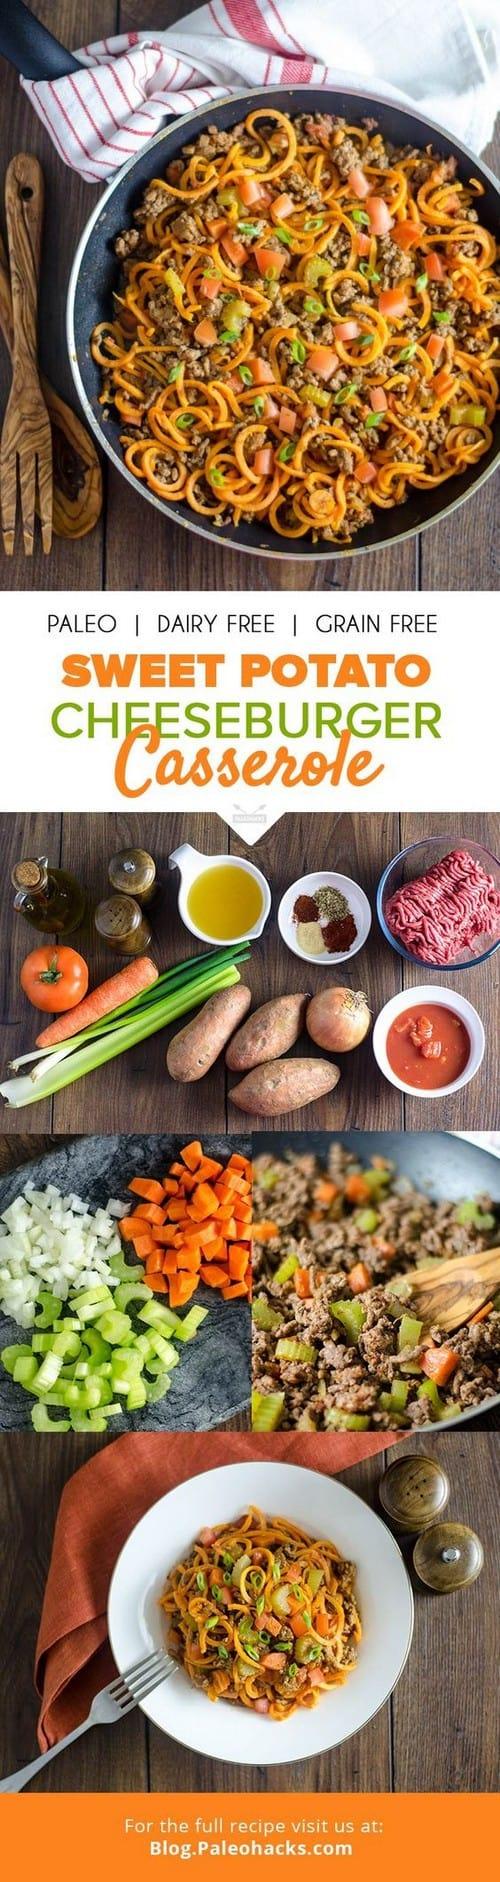 Whole30 Sweet Potato Cheeseburger Casserole